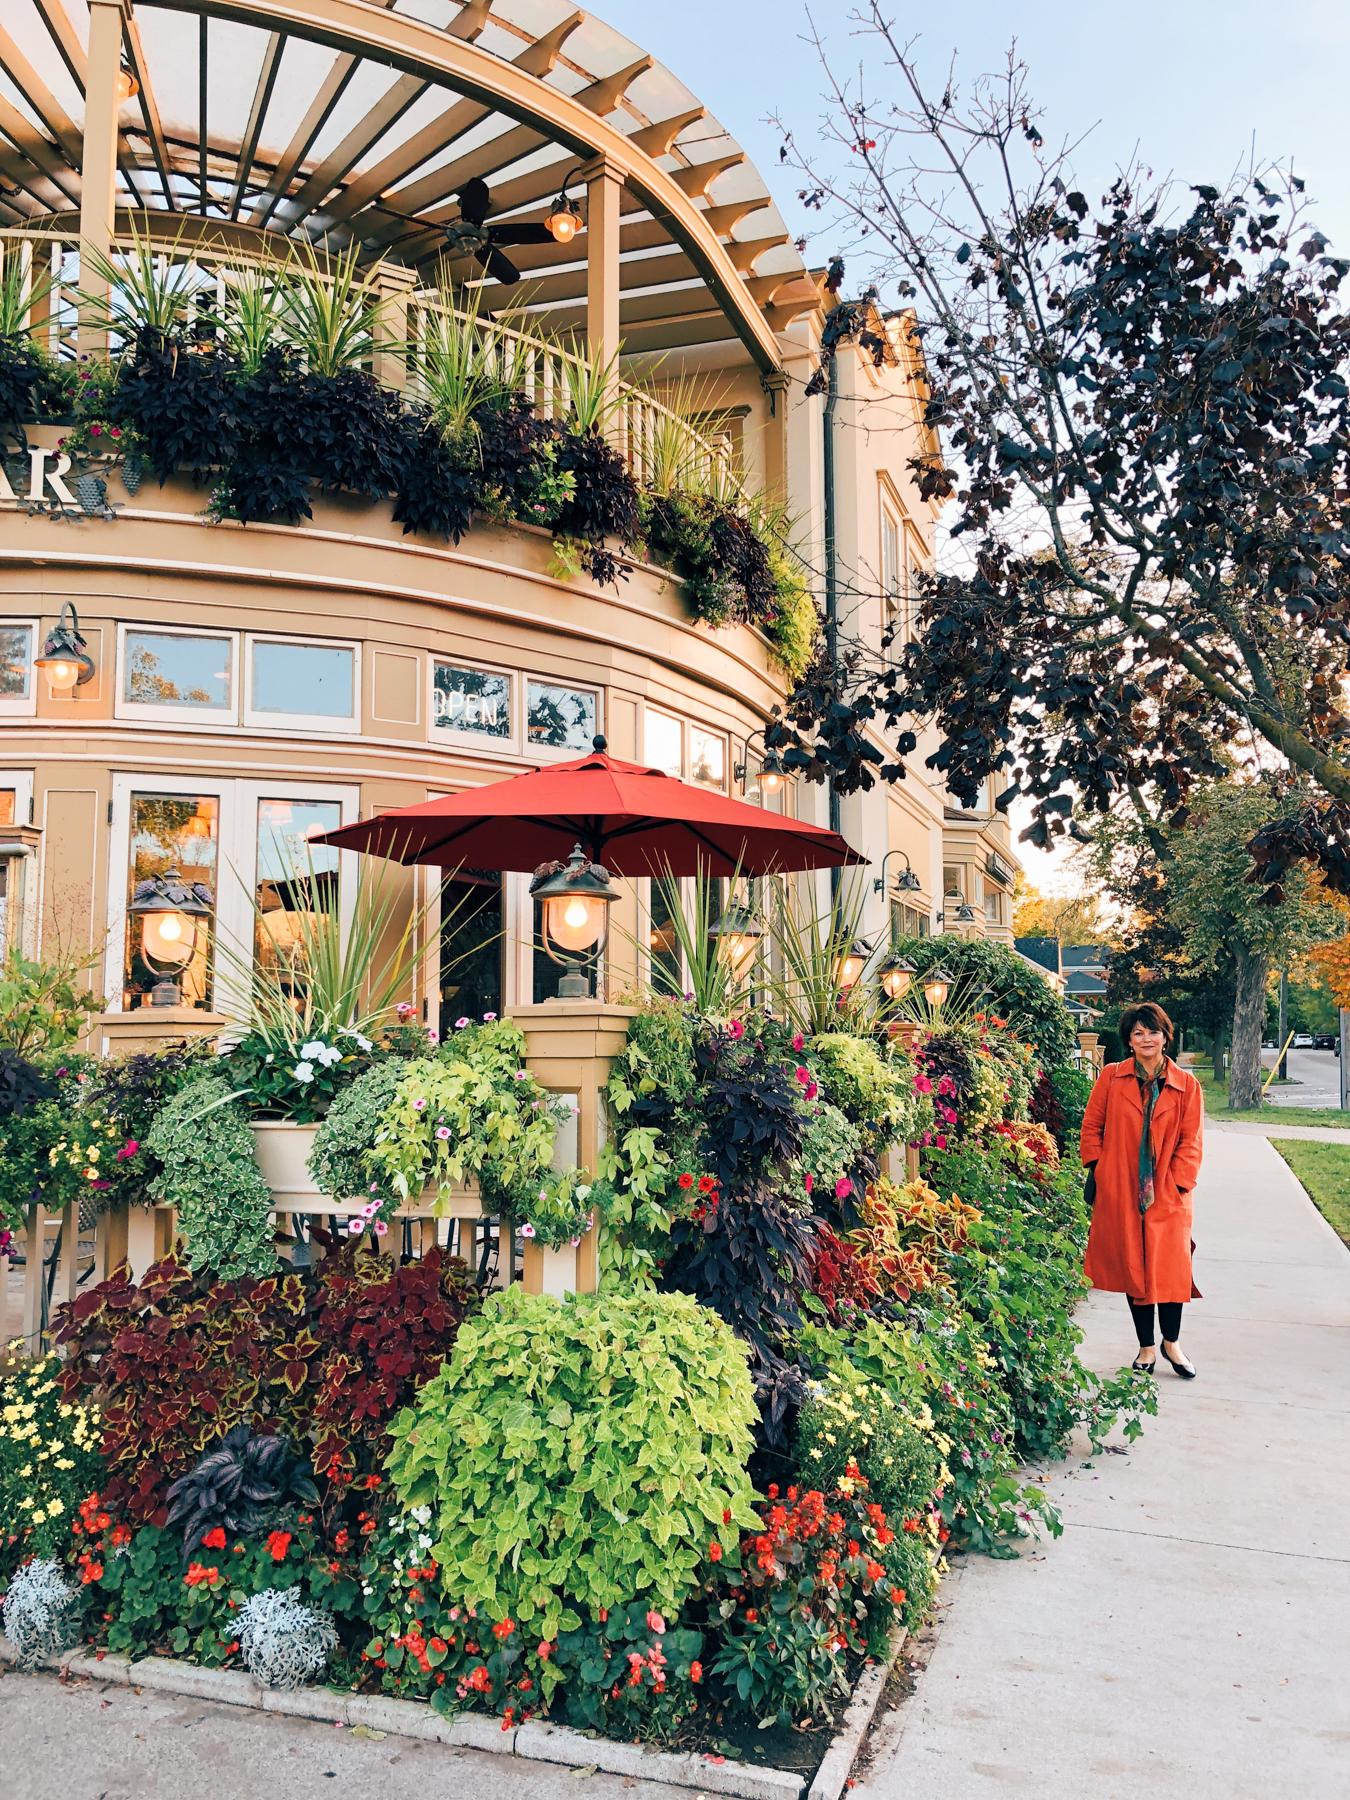 The town of Niagara-On-The-Lake